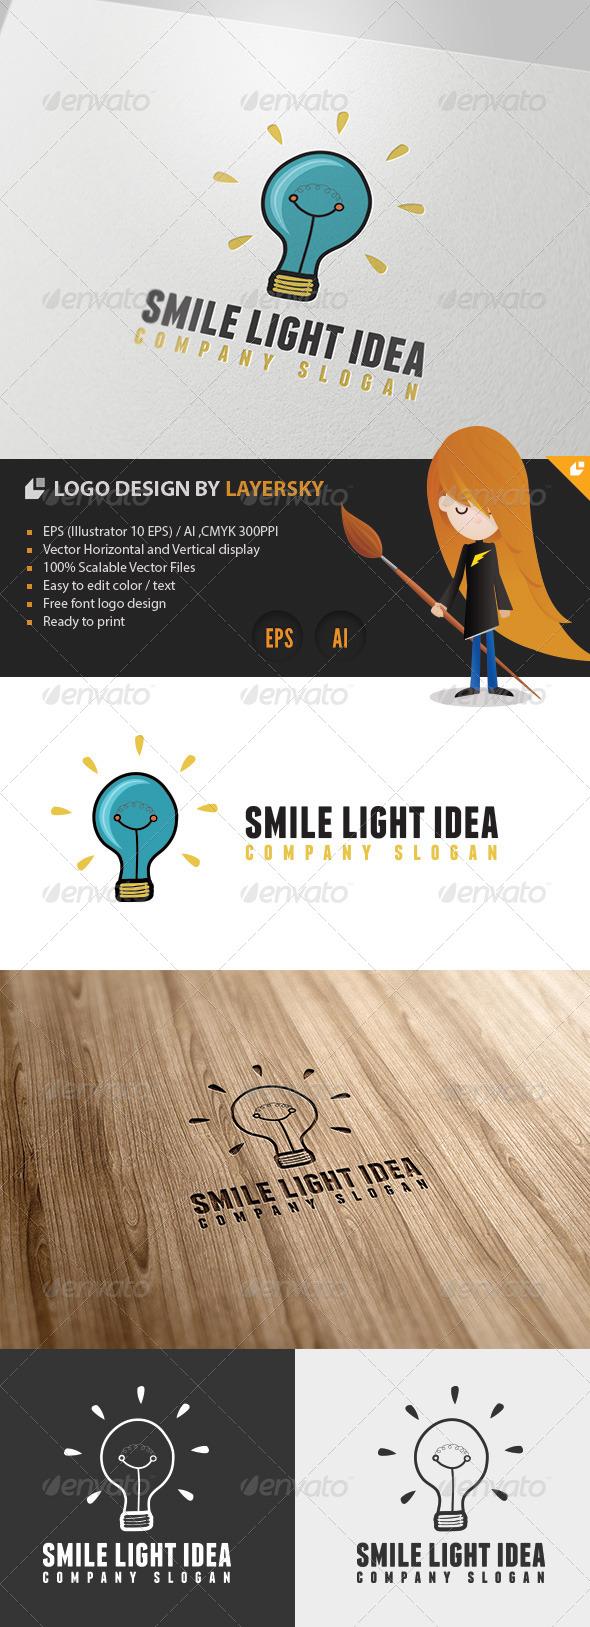 Smile Light Idea Logo - Objects Logo Templates